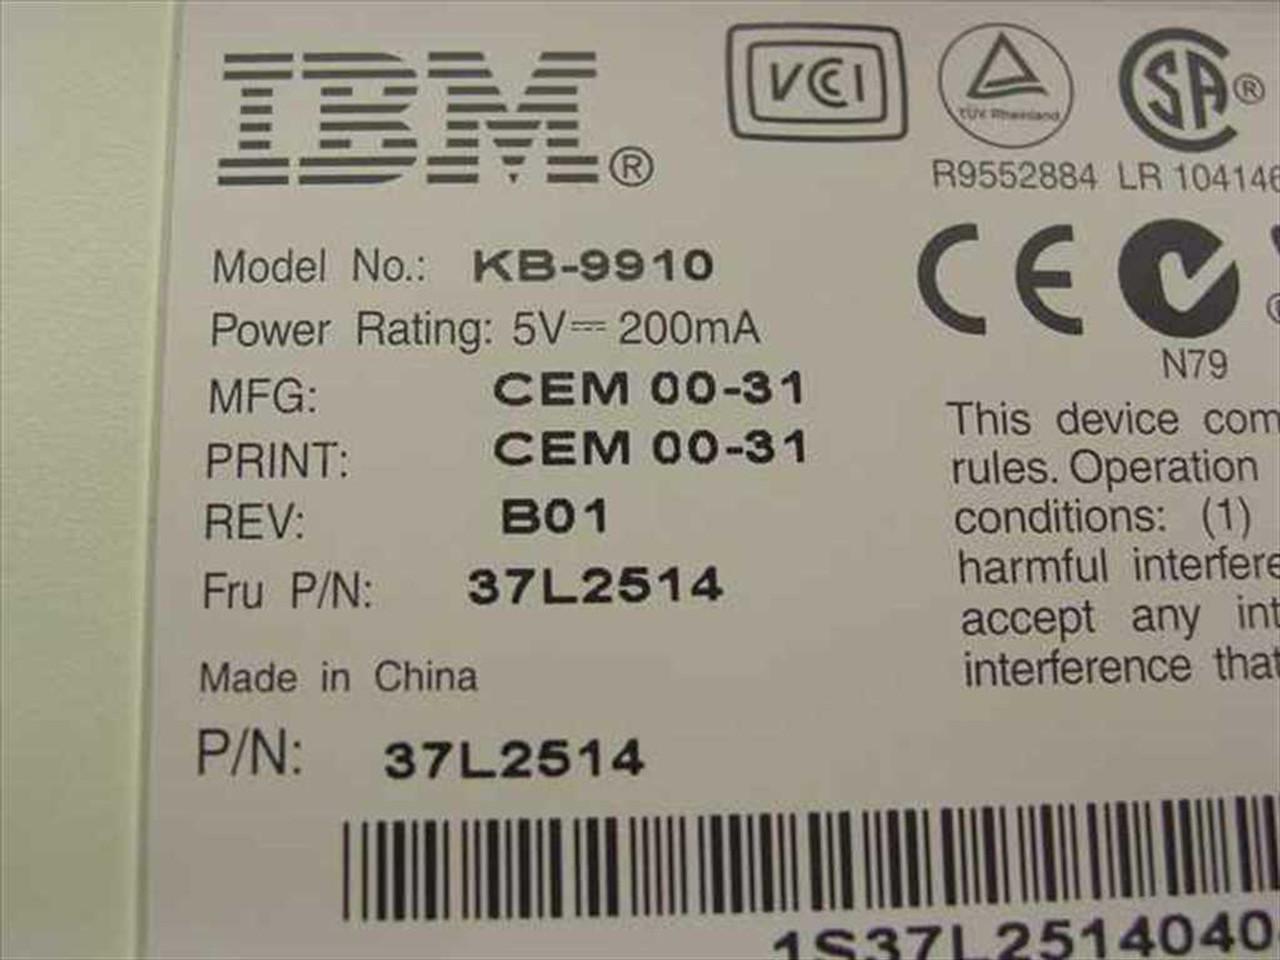 ibm-keyboard-fru-37l2514-or-02k0848-kb-9